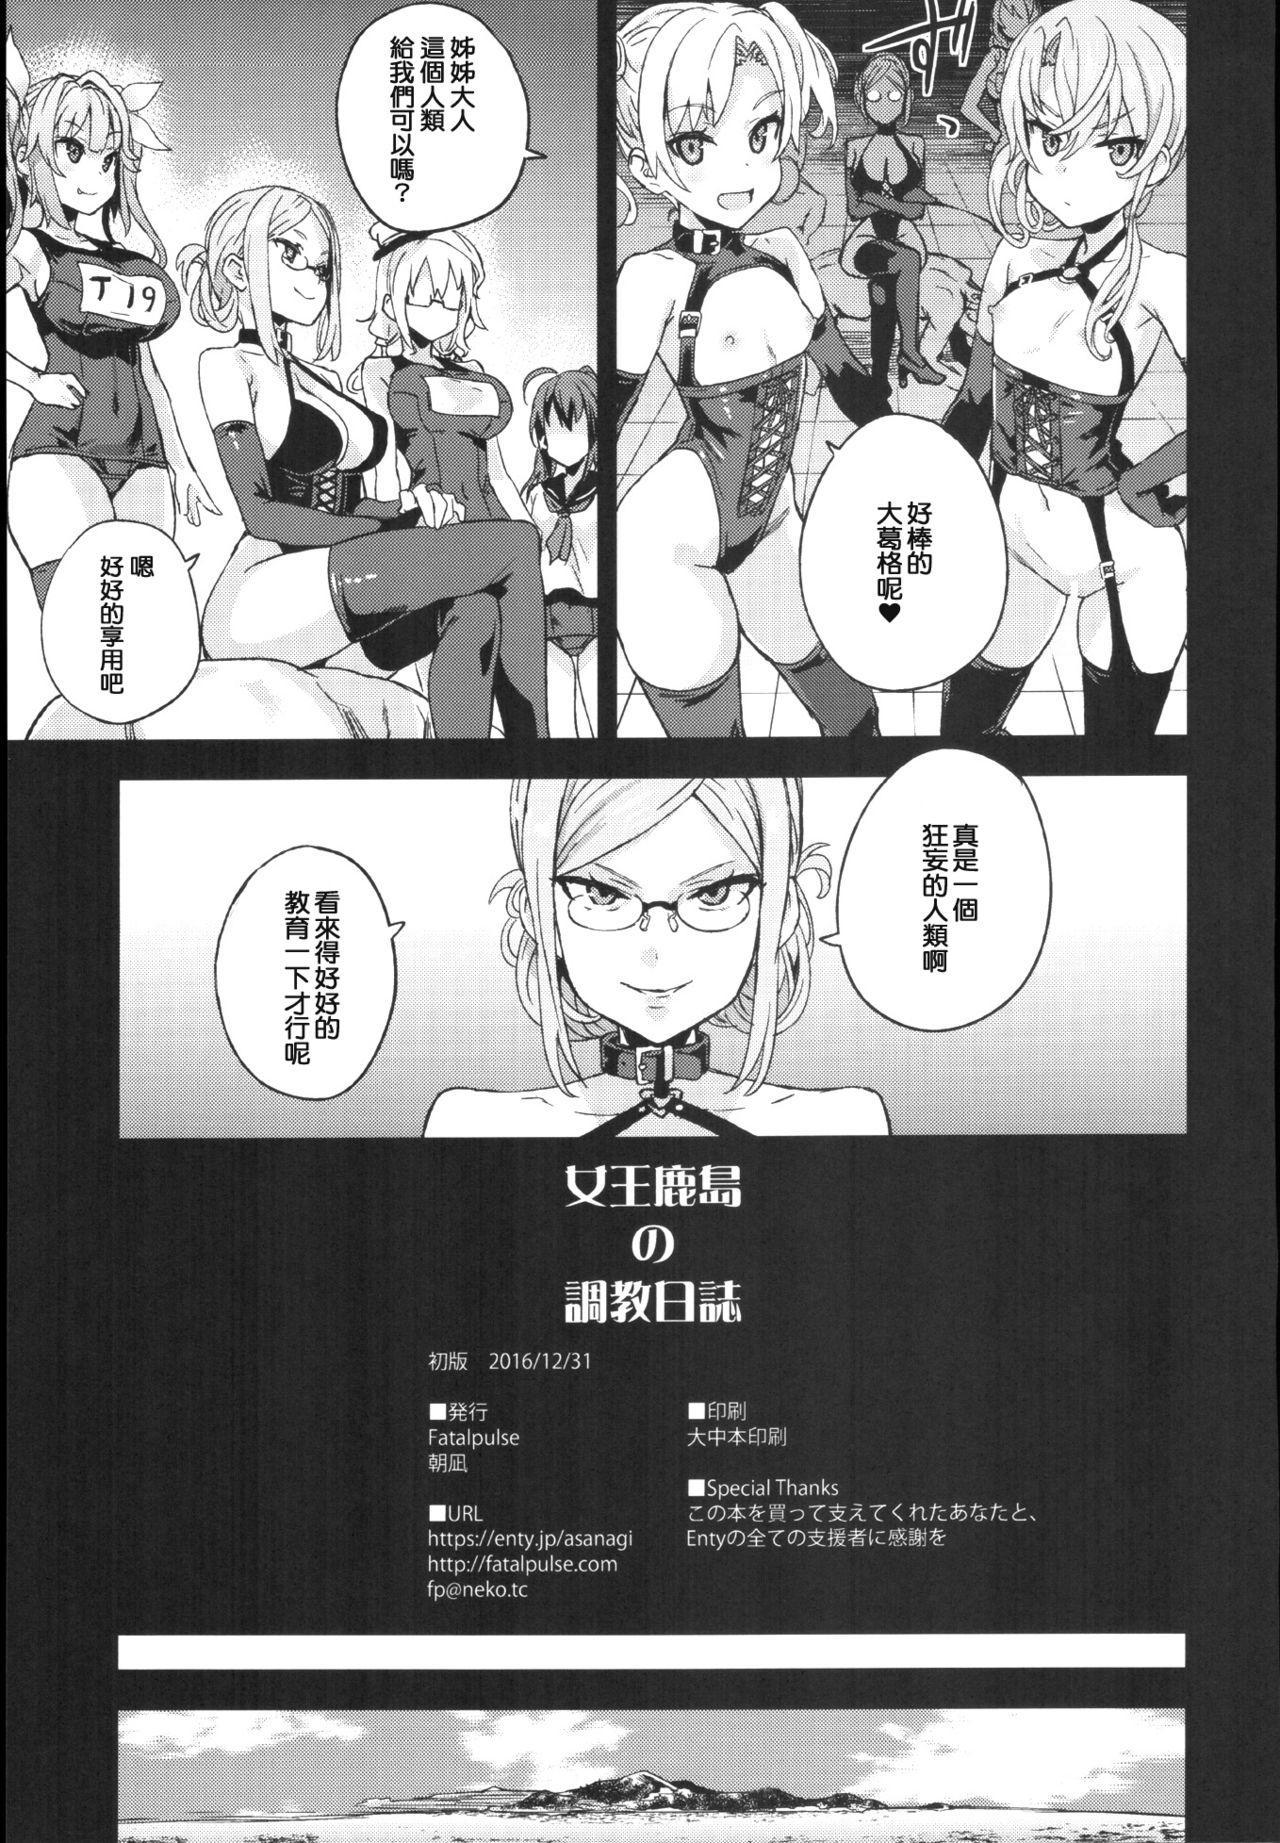 Victim Girls 22 Joou Kashima no Choukyou Nisshi 29